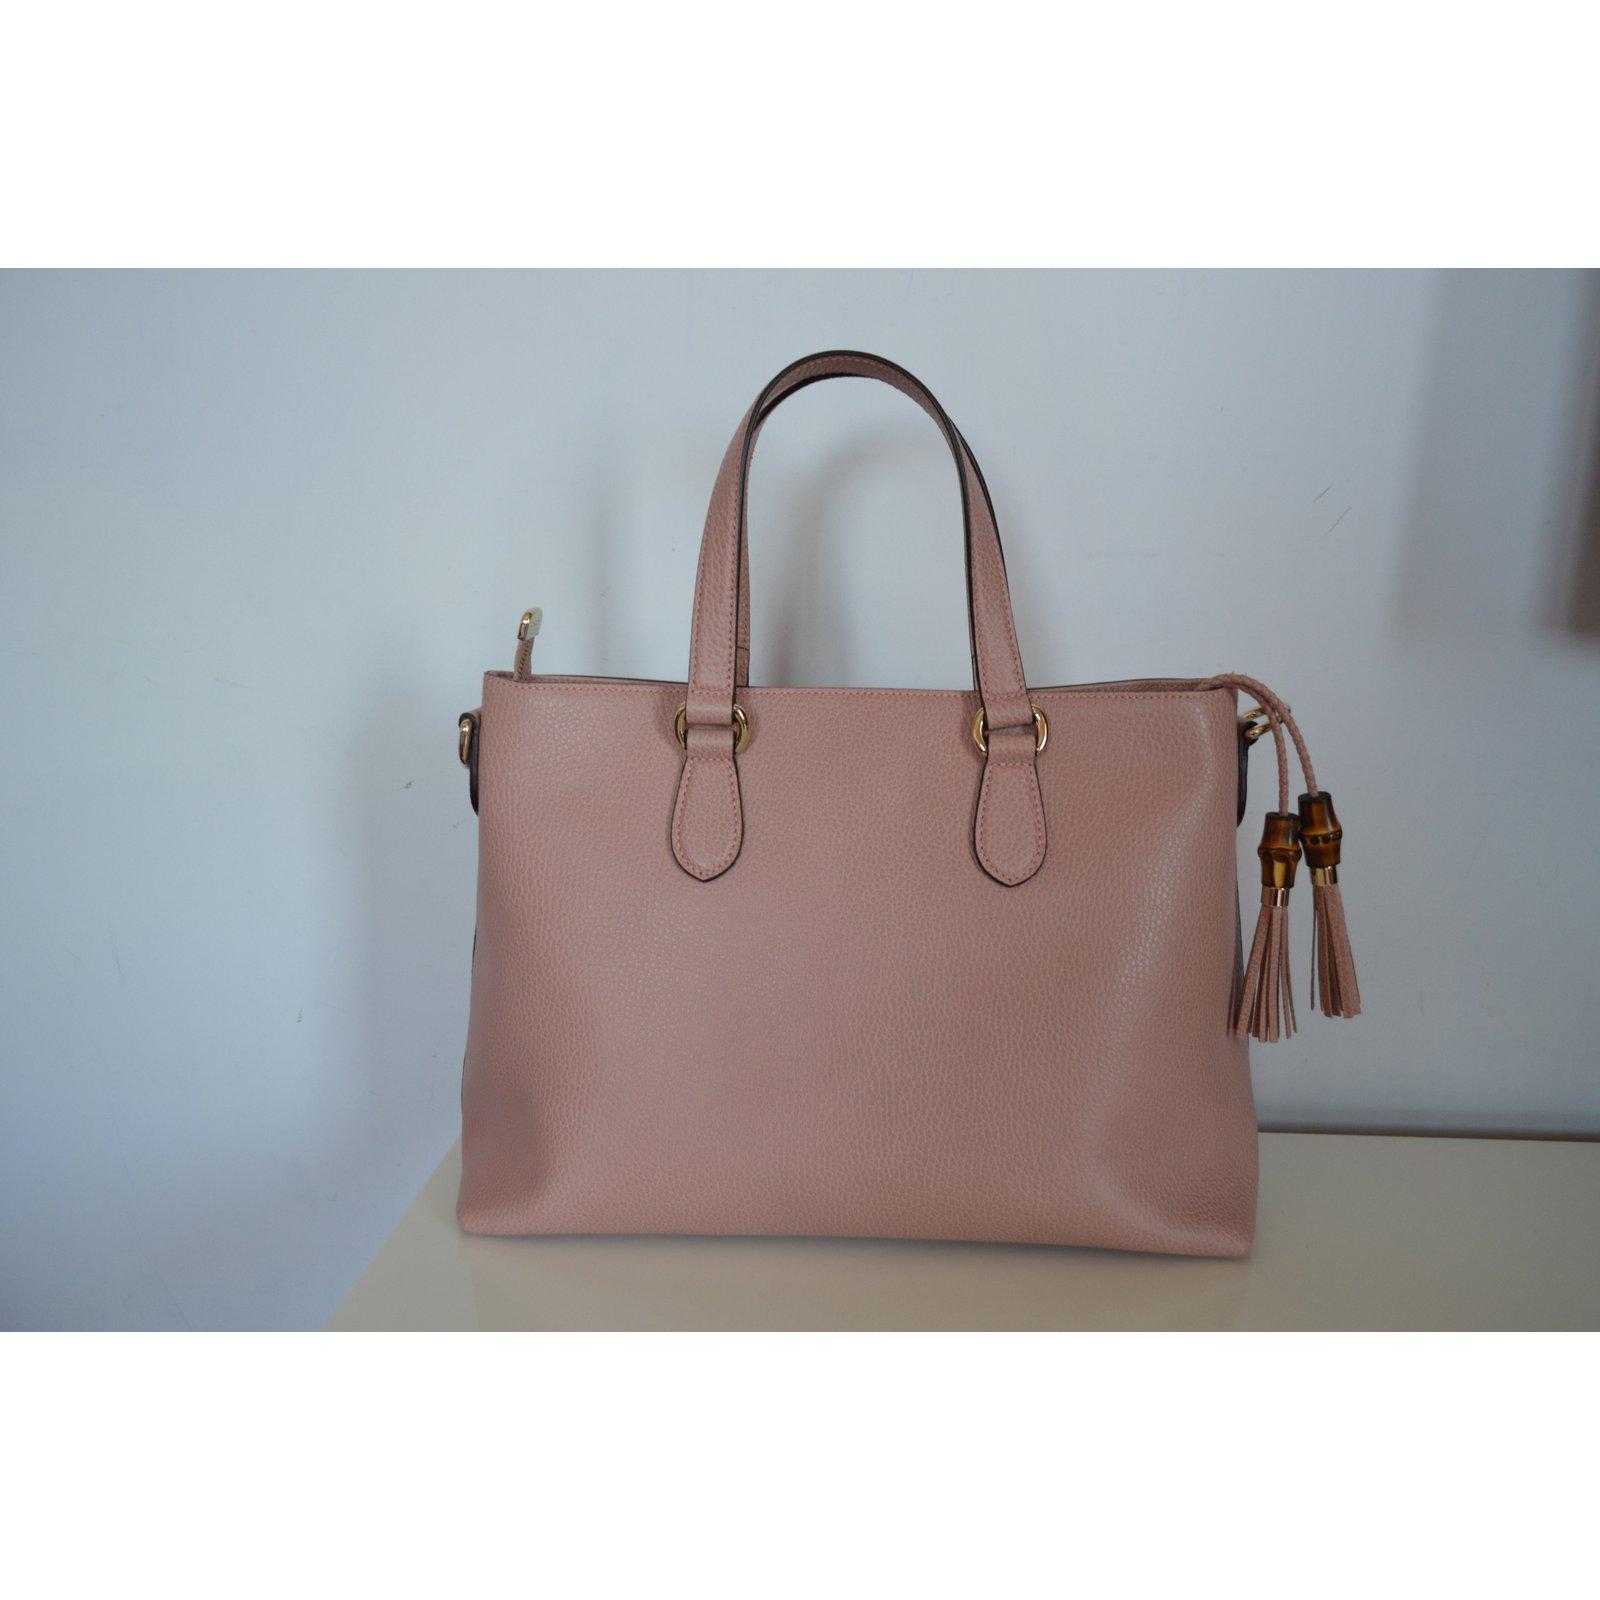 fb832ddce Gucci Handbag Handbags Leather Pink ref.77528 - Joli Closet